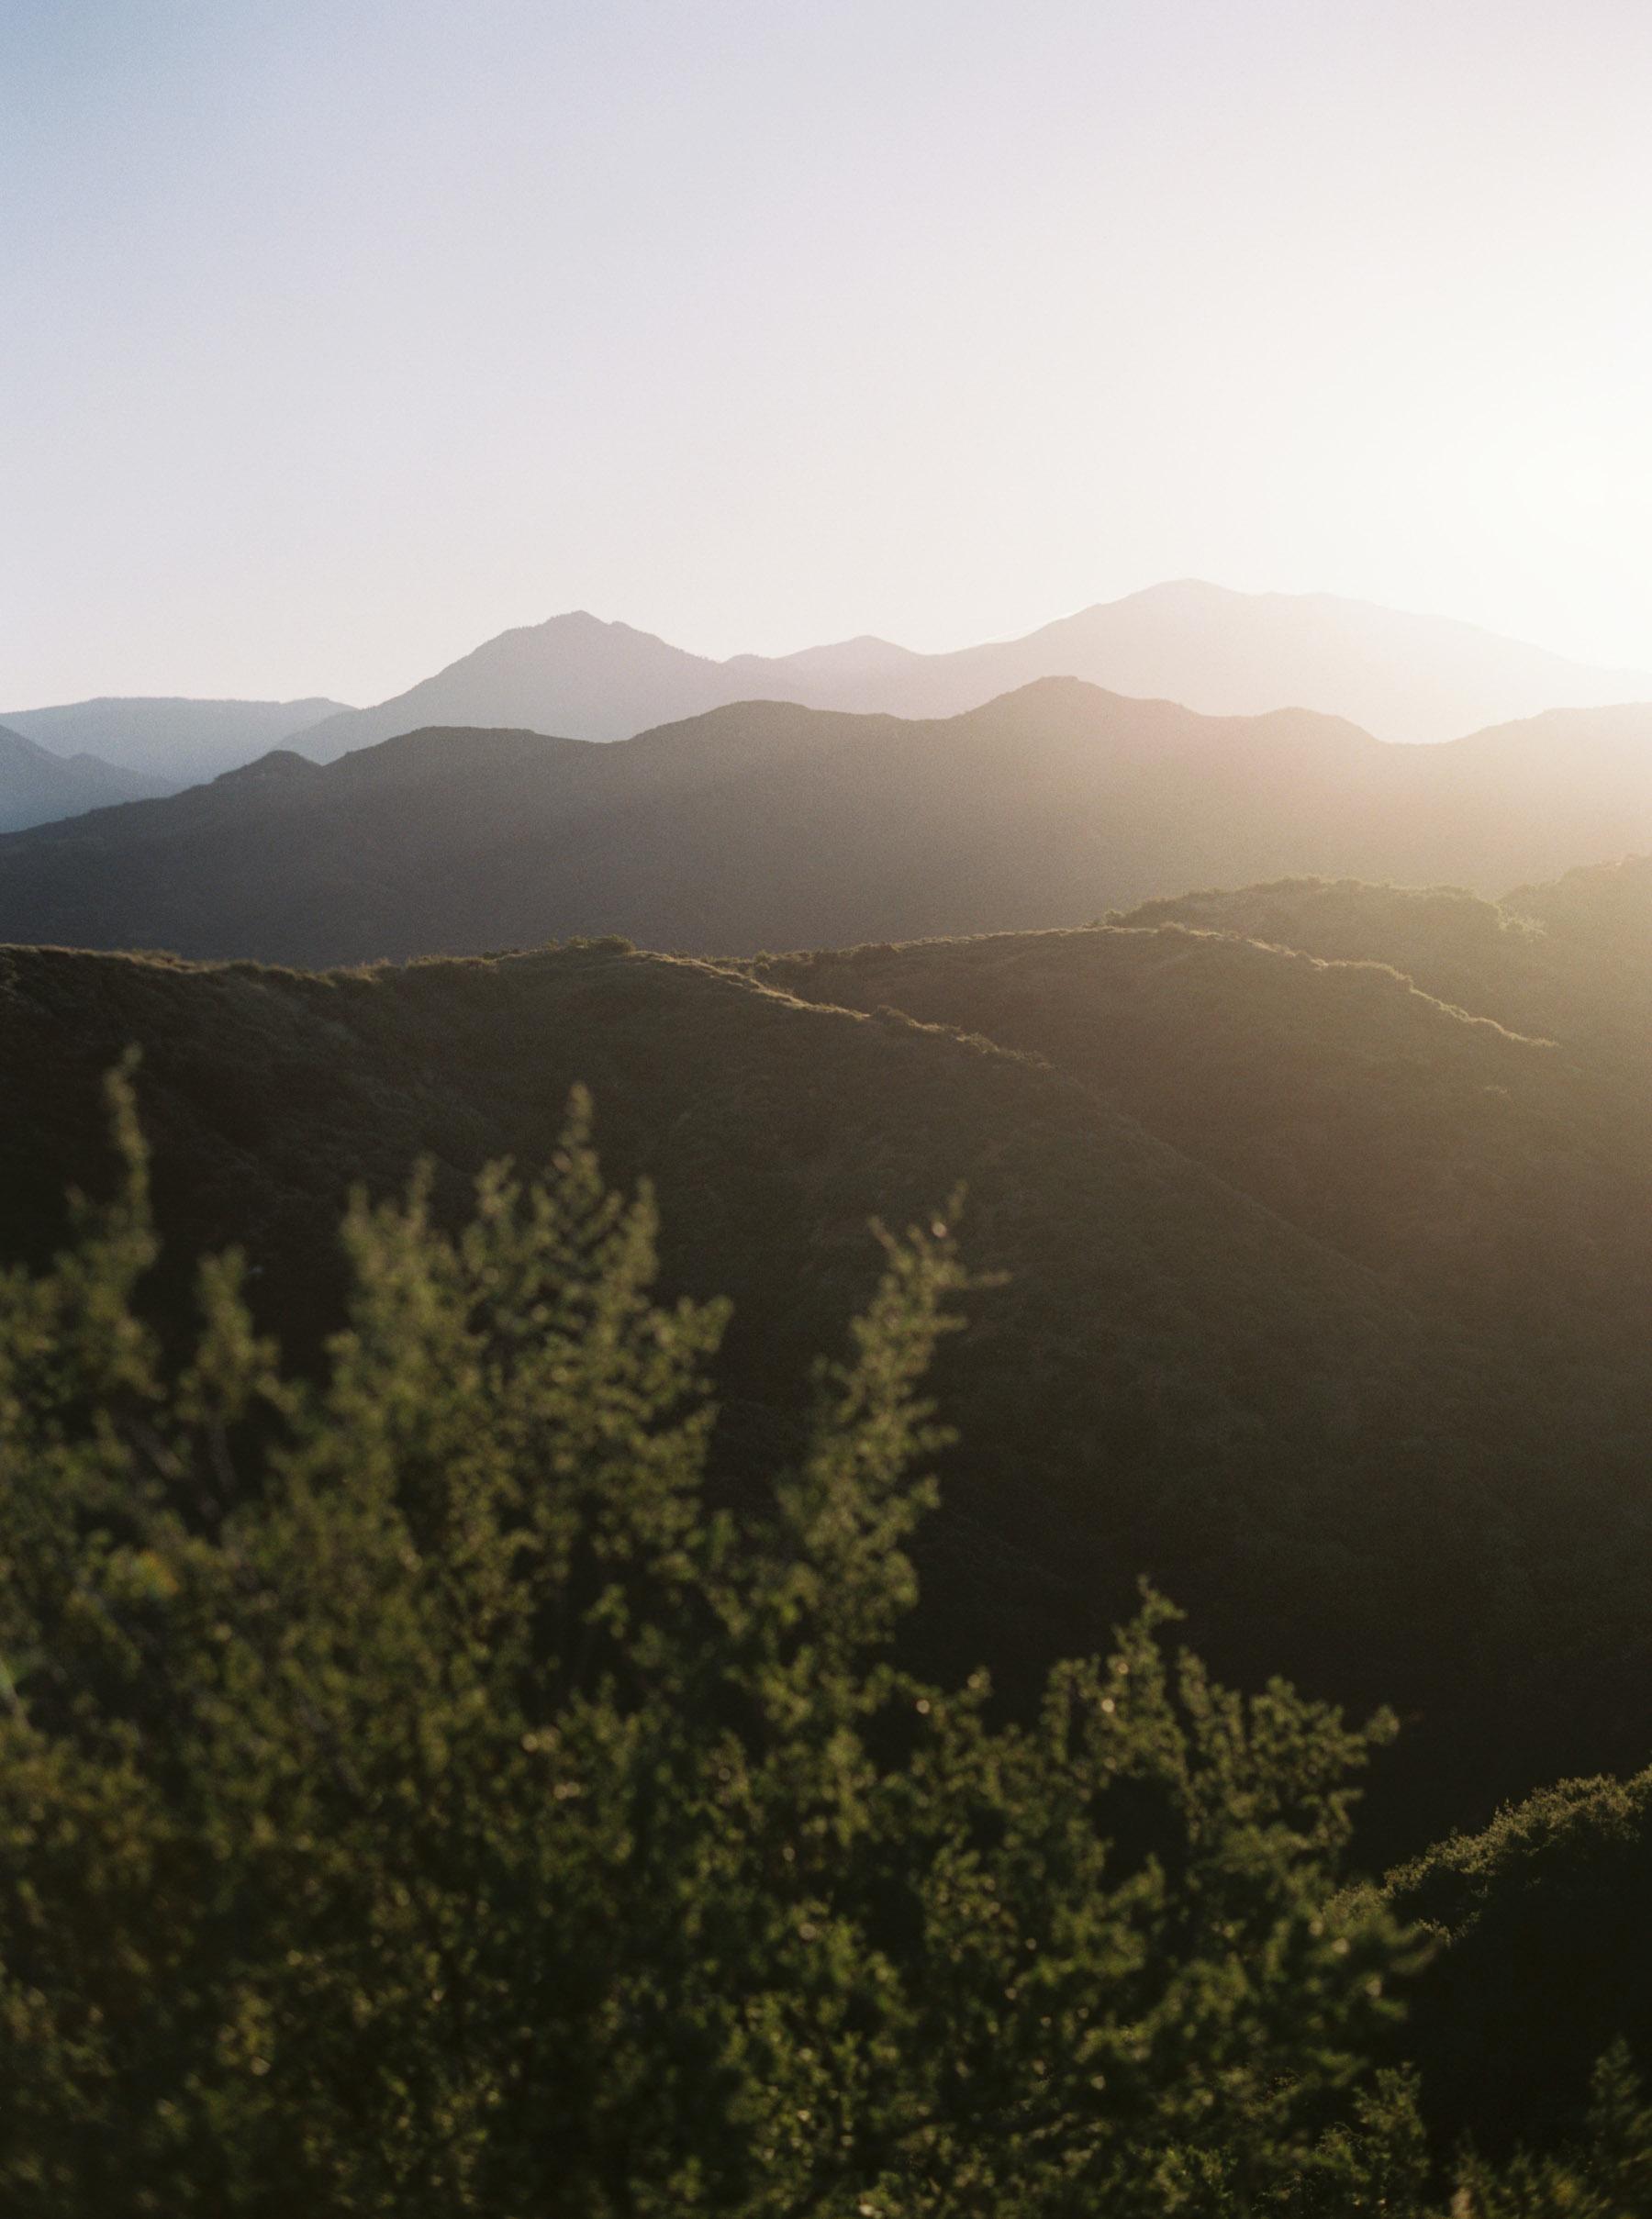 California, Justin Chung, Mount Baldy